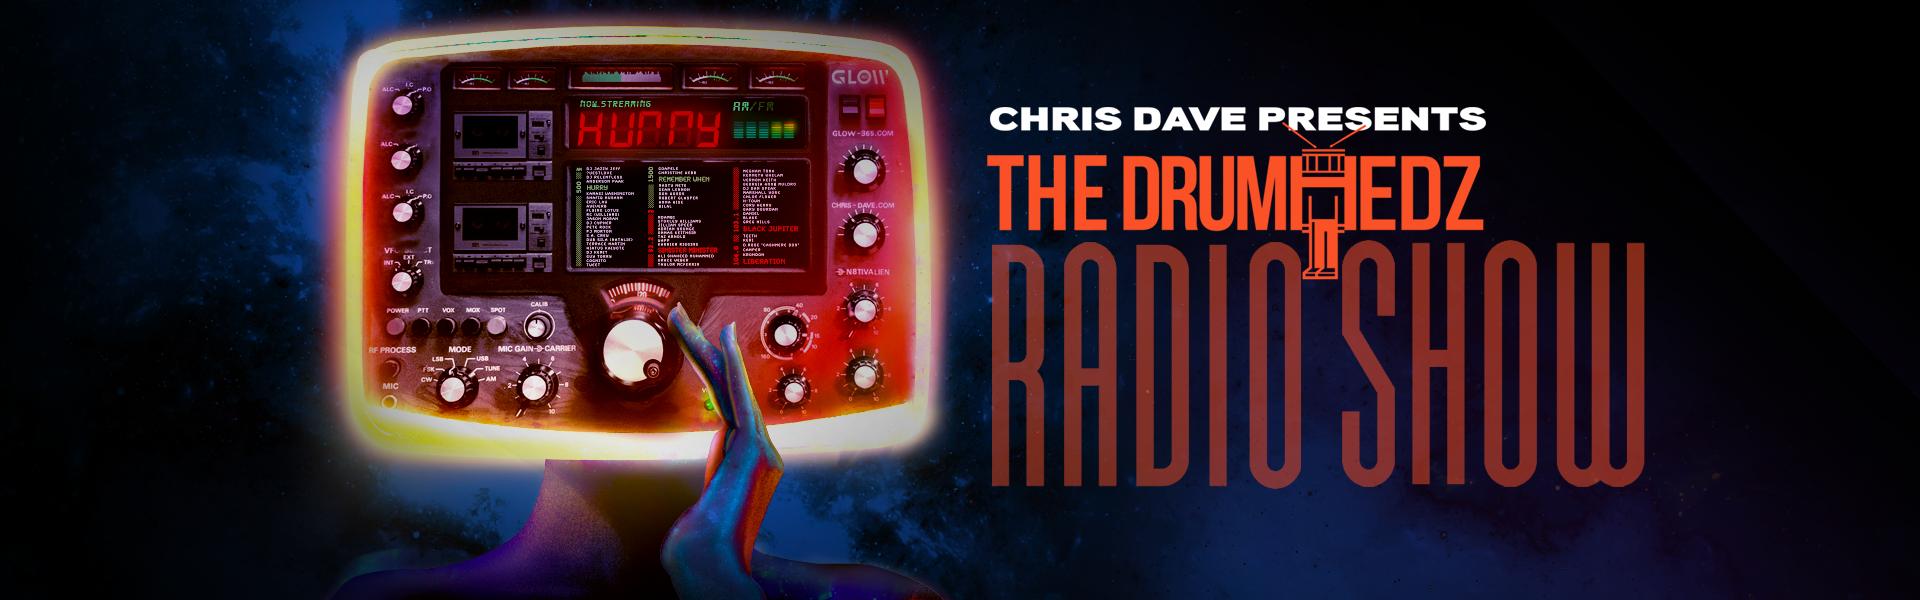 Chris Dave & The Drumhedz- Hurry